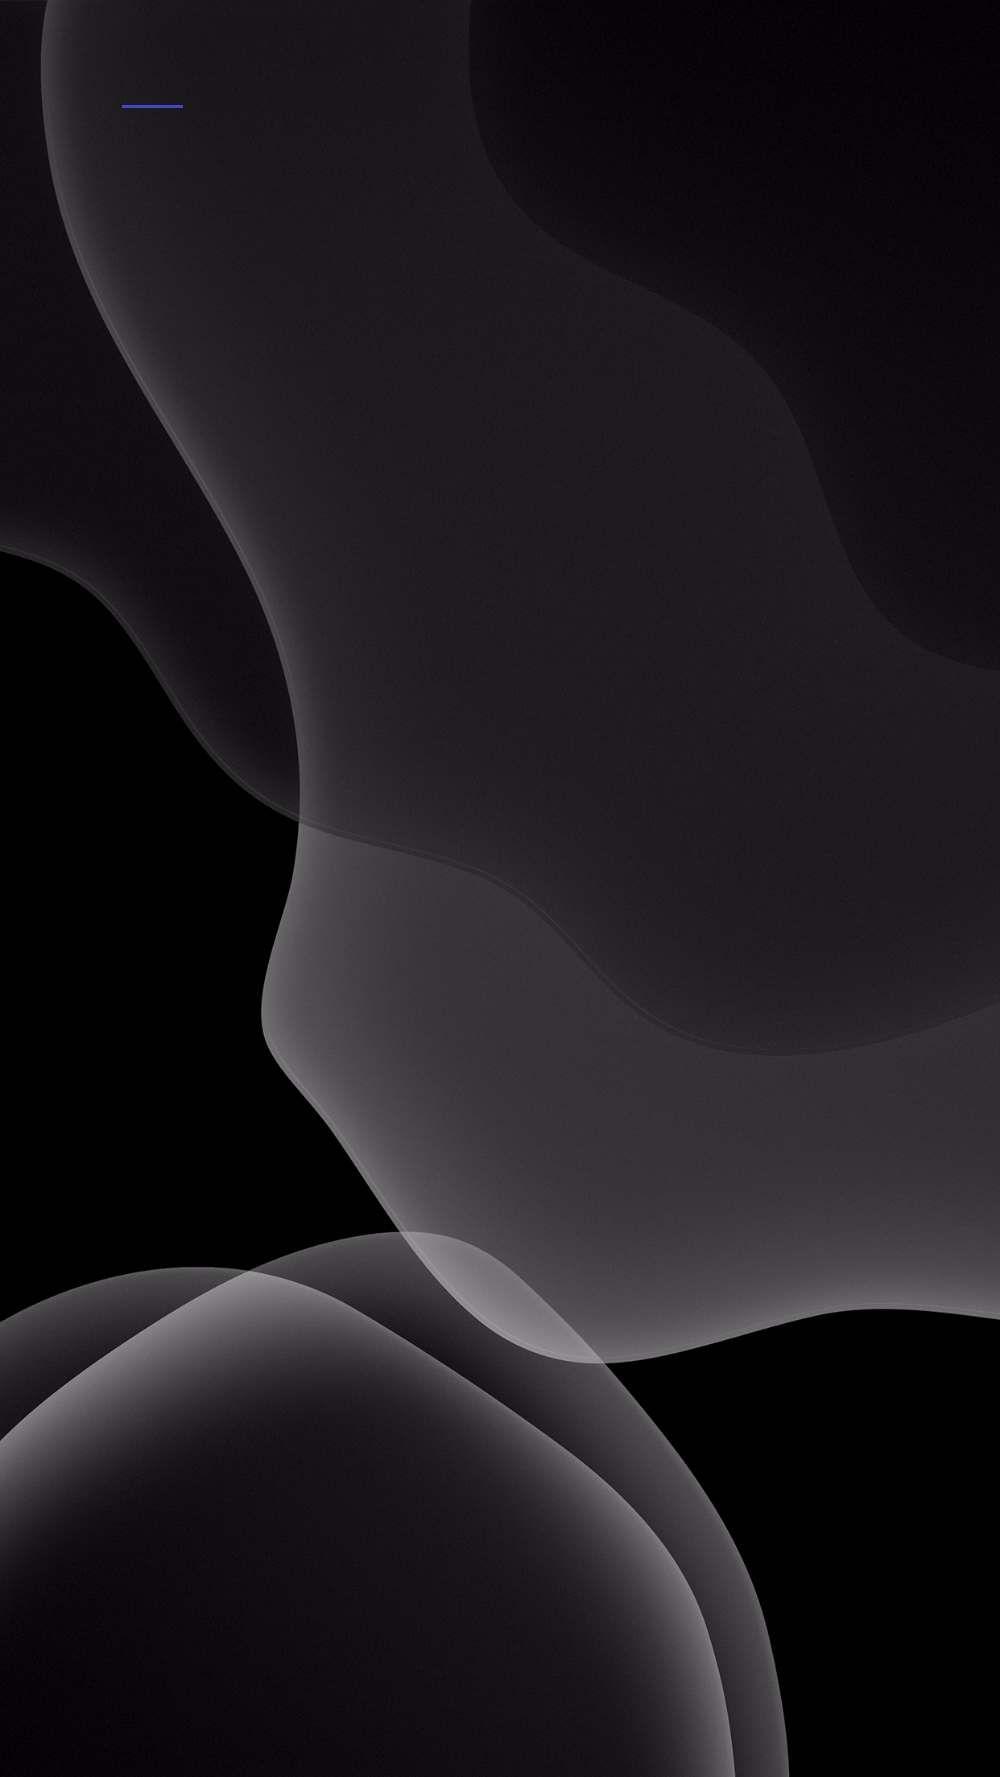 Ios 7 Dark Mode Br In 2020 Blue Wallpaper Iphone Grey Wallpaper Iphone Dark Wallpaper Iphone